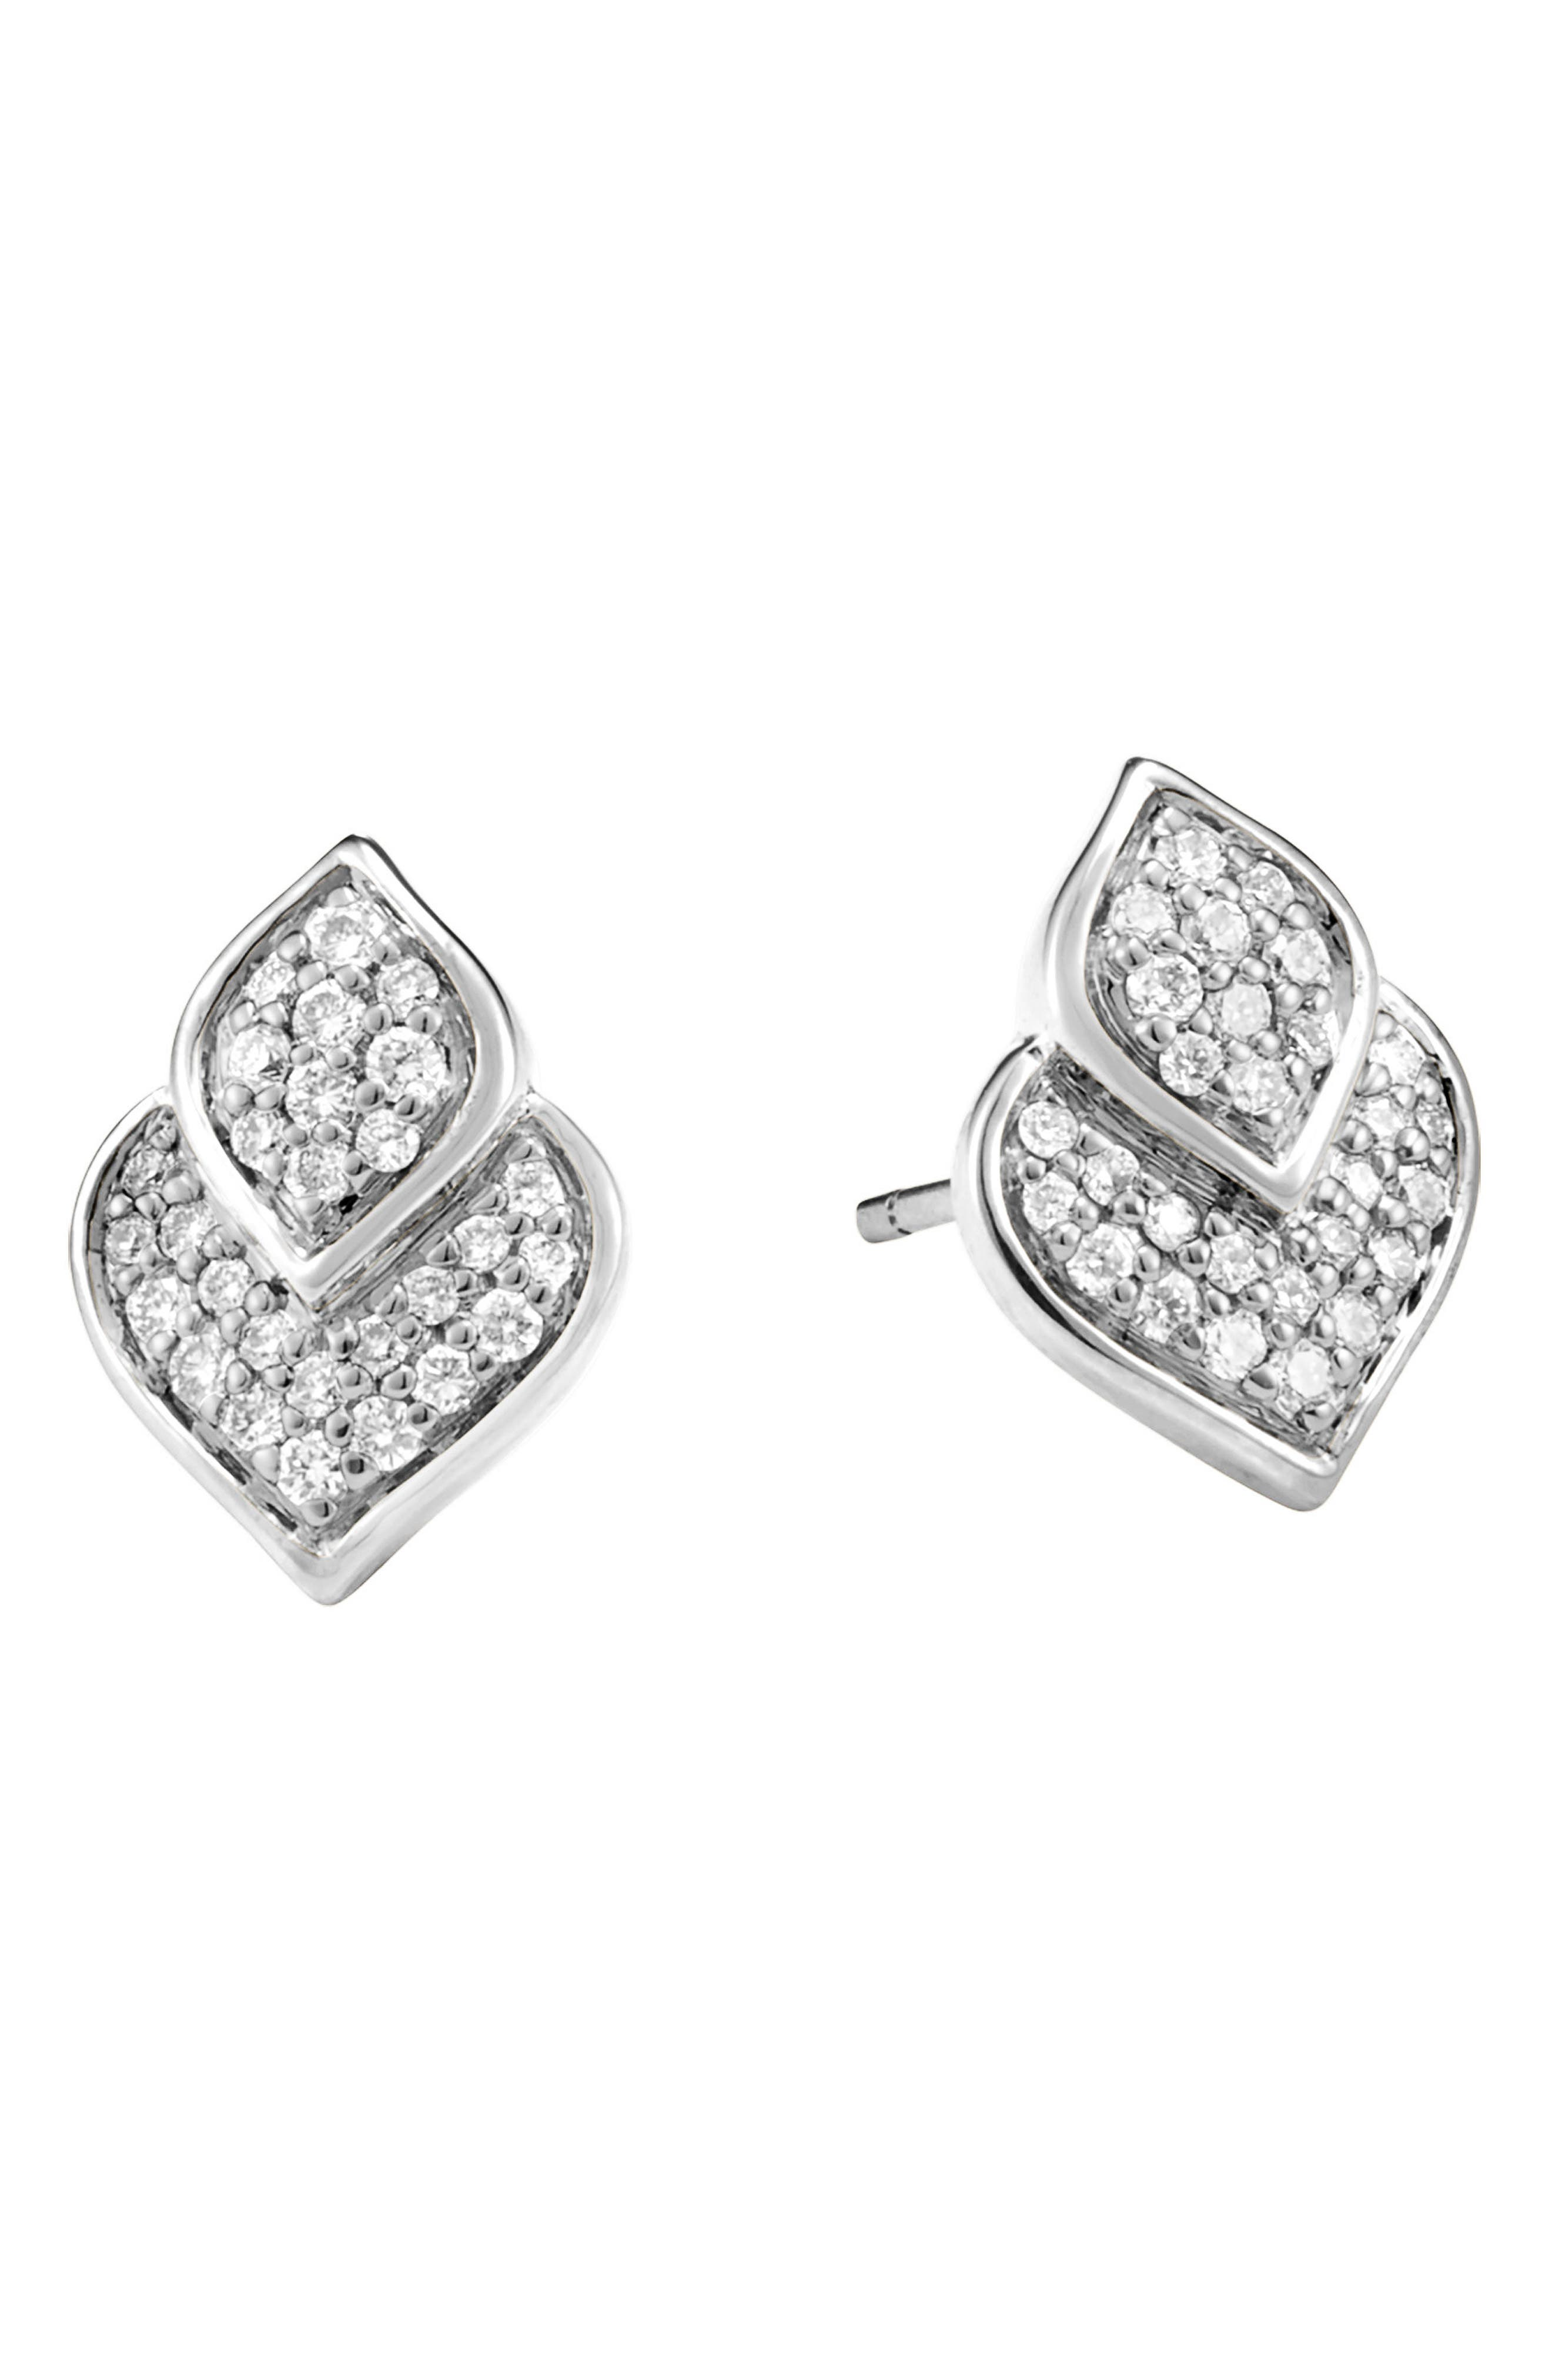 John Hardy Legends Naga Pavé Diamond Stud Earrings